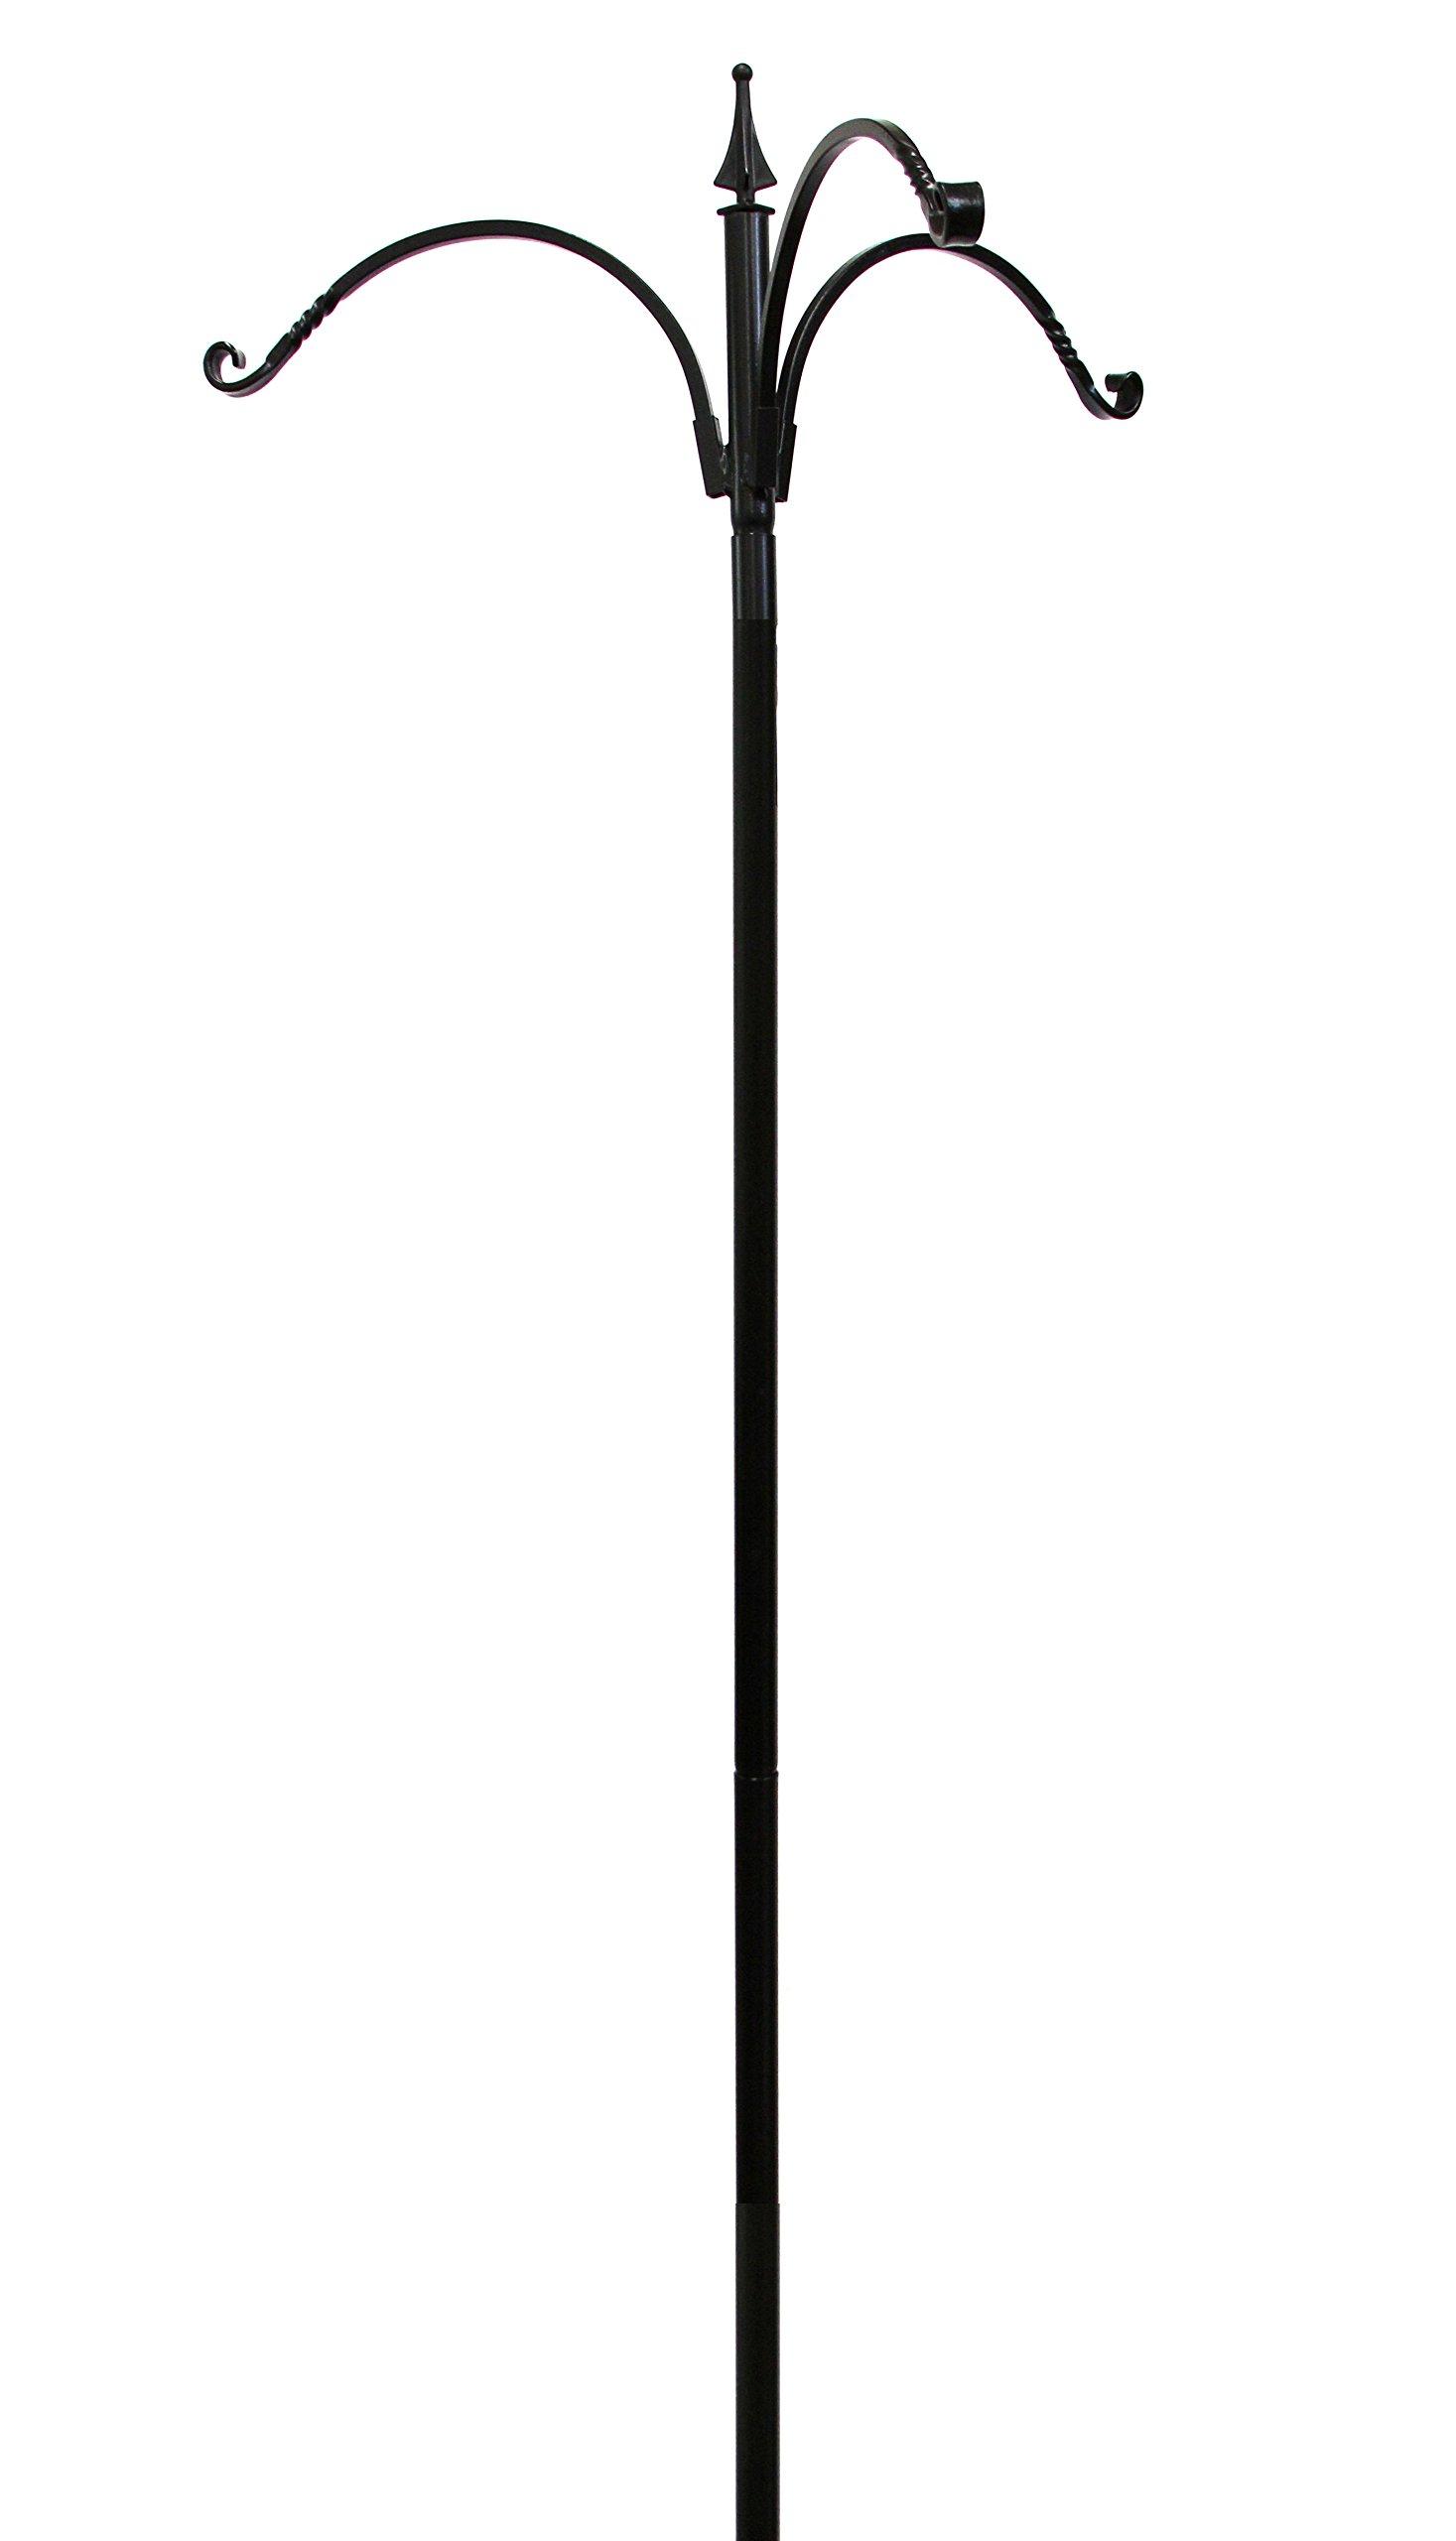 Kettle Moraine 3 Arm Bird Feeder Pole Set with Twister Ground Socket